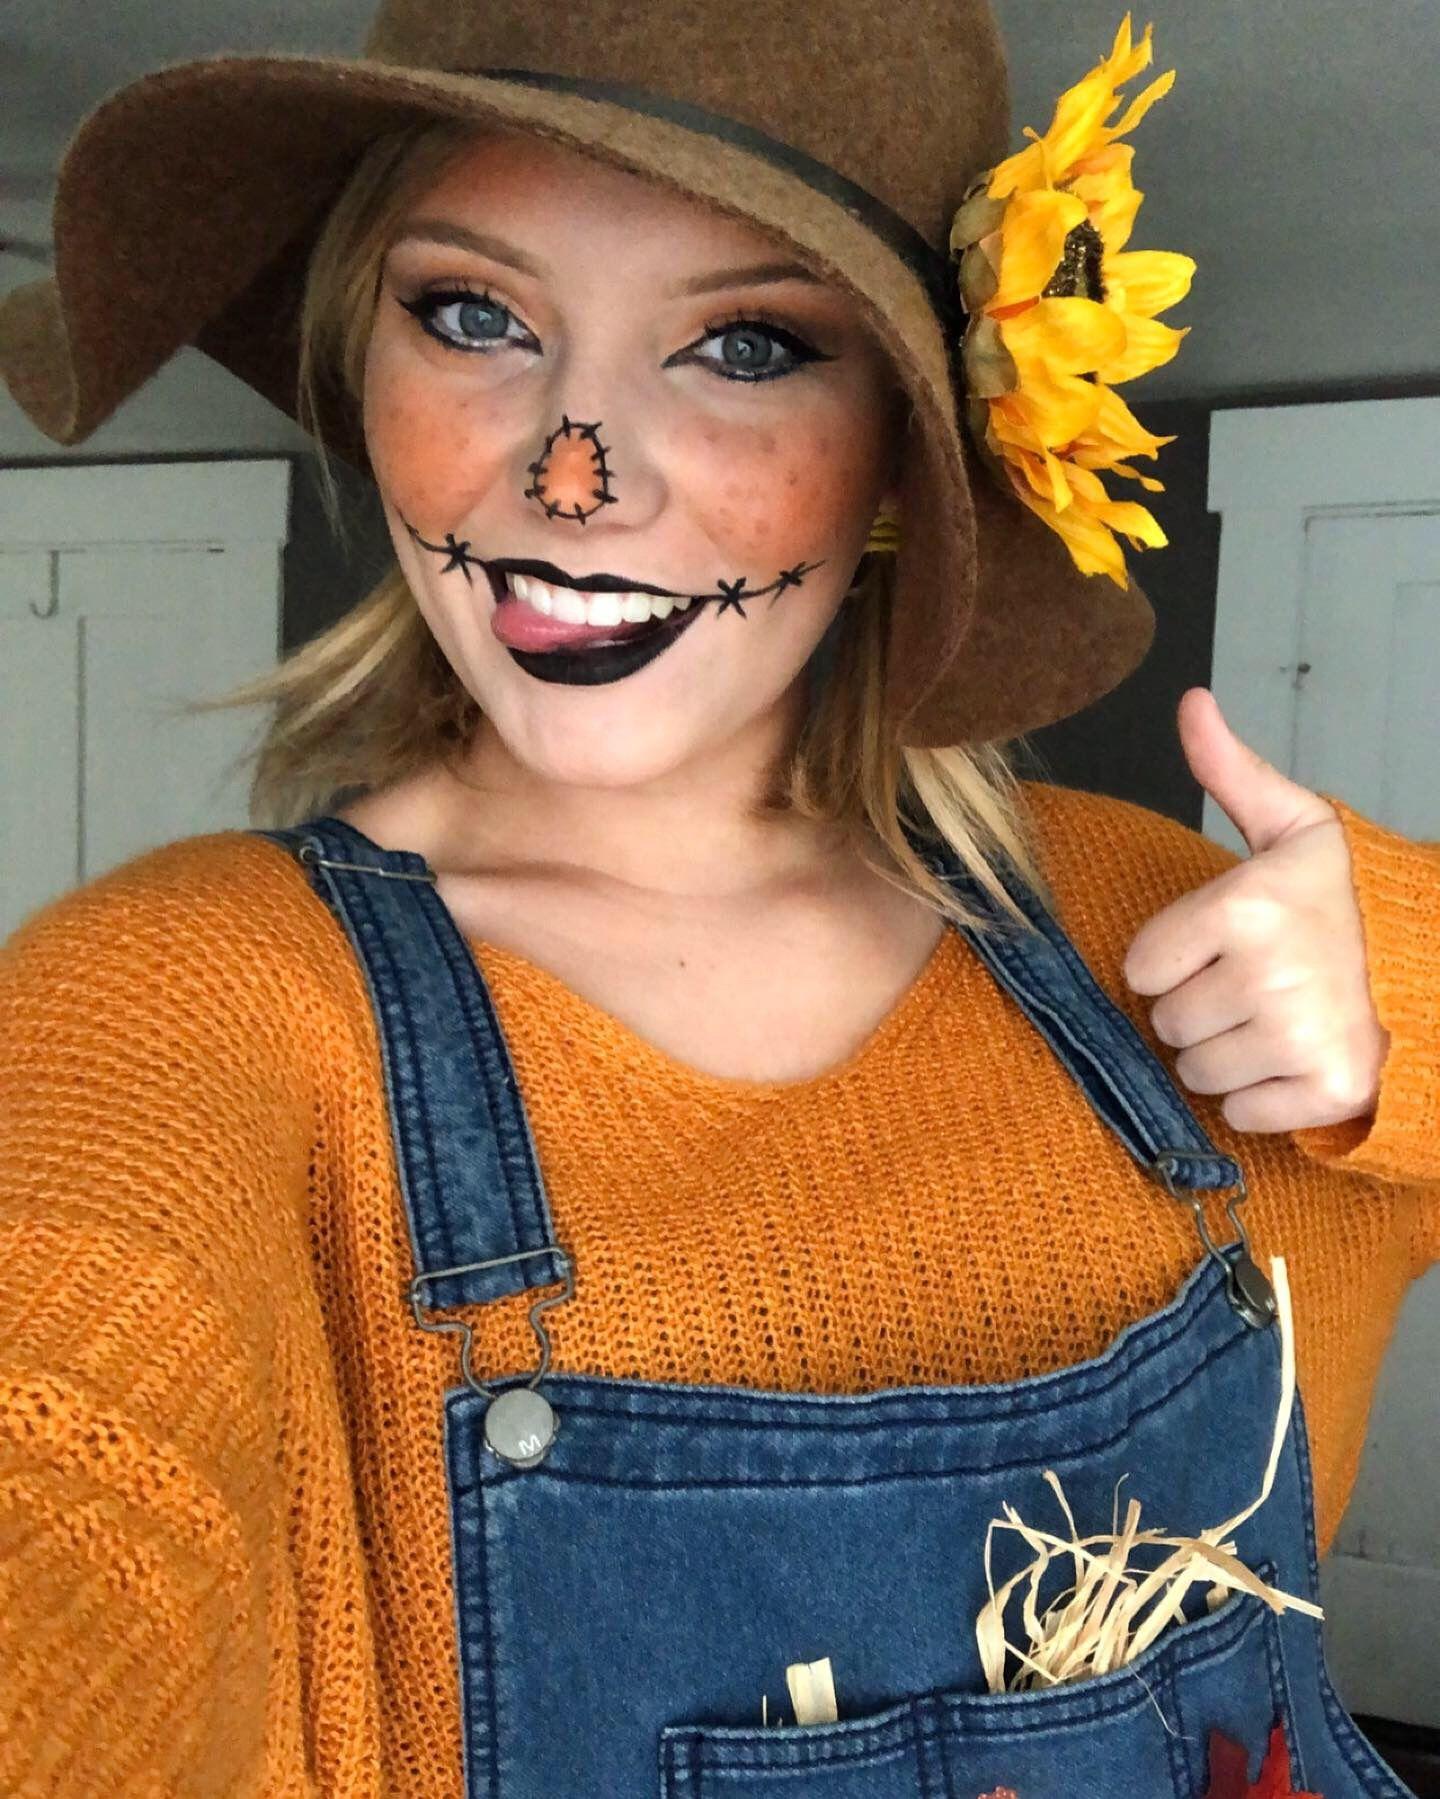 Halloween 2019: Scarecrow #scarecrowmakeup